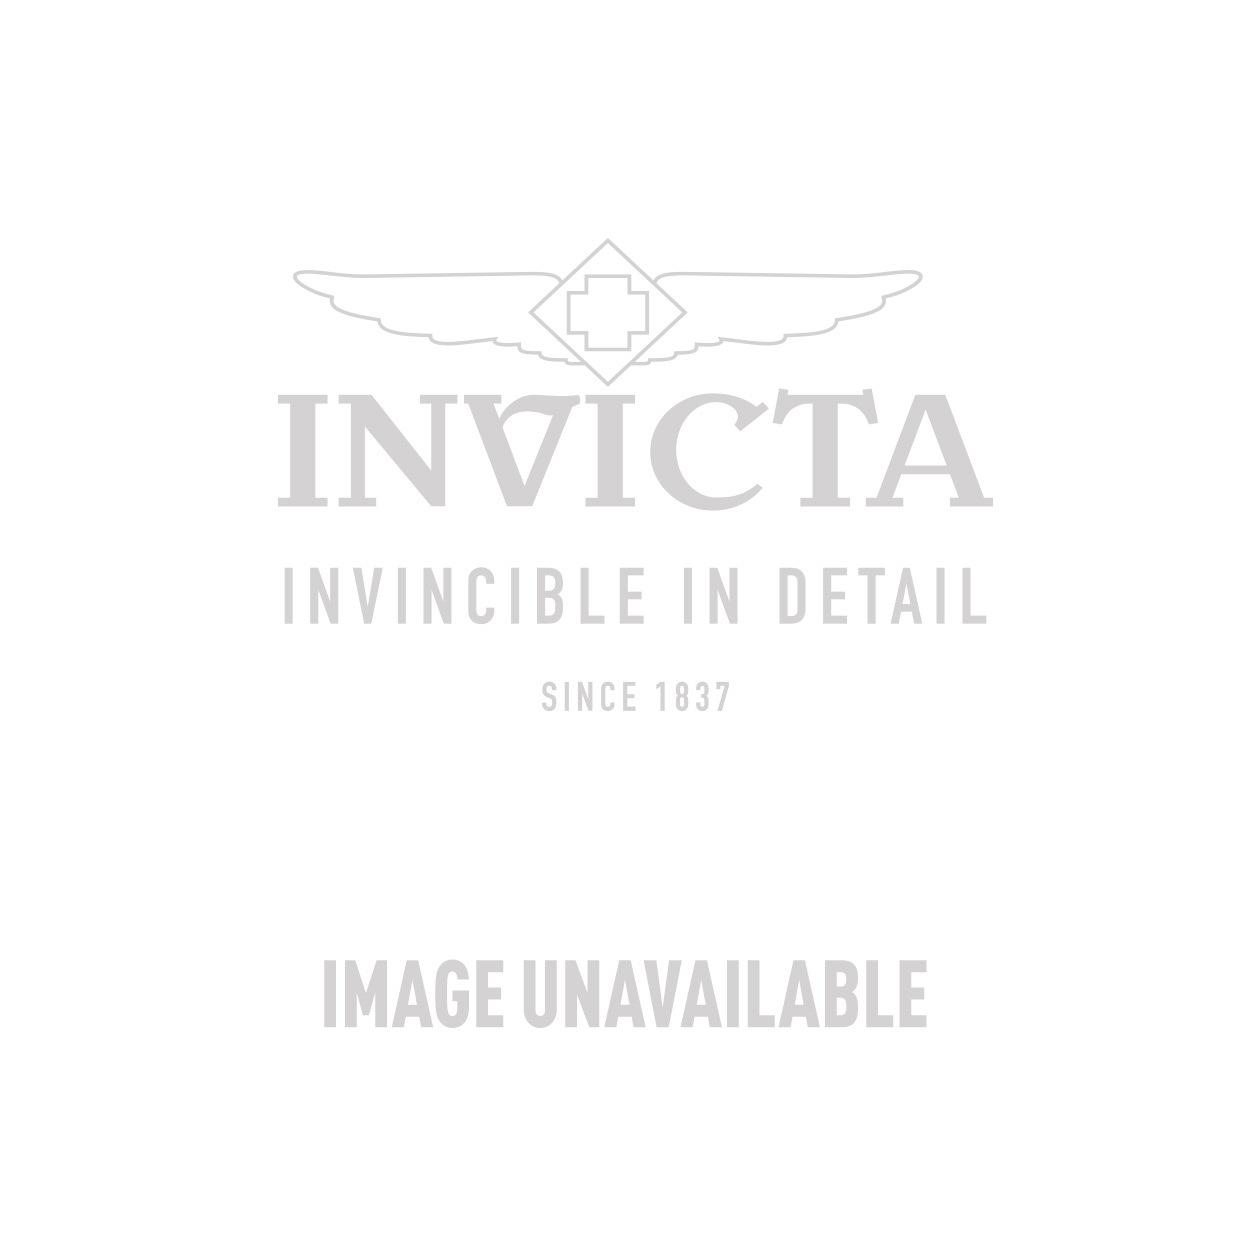 7375f24ee Invicta Subaqua NOMA III Mens Quartz 50mm Black Case Stainless Steel Dial  Model - 0877 - Official Invicta Store